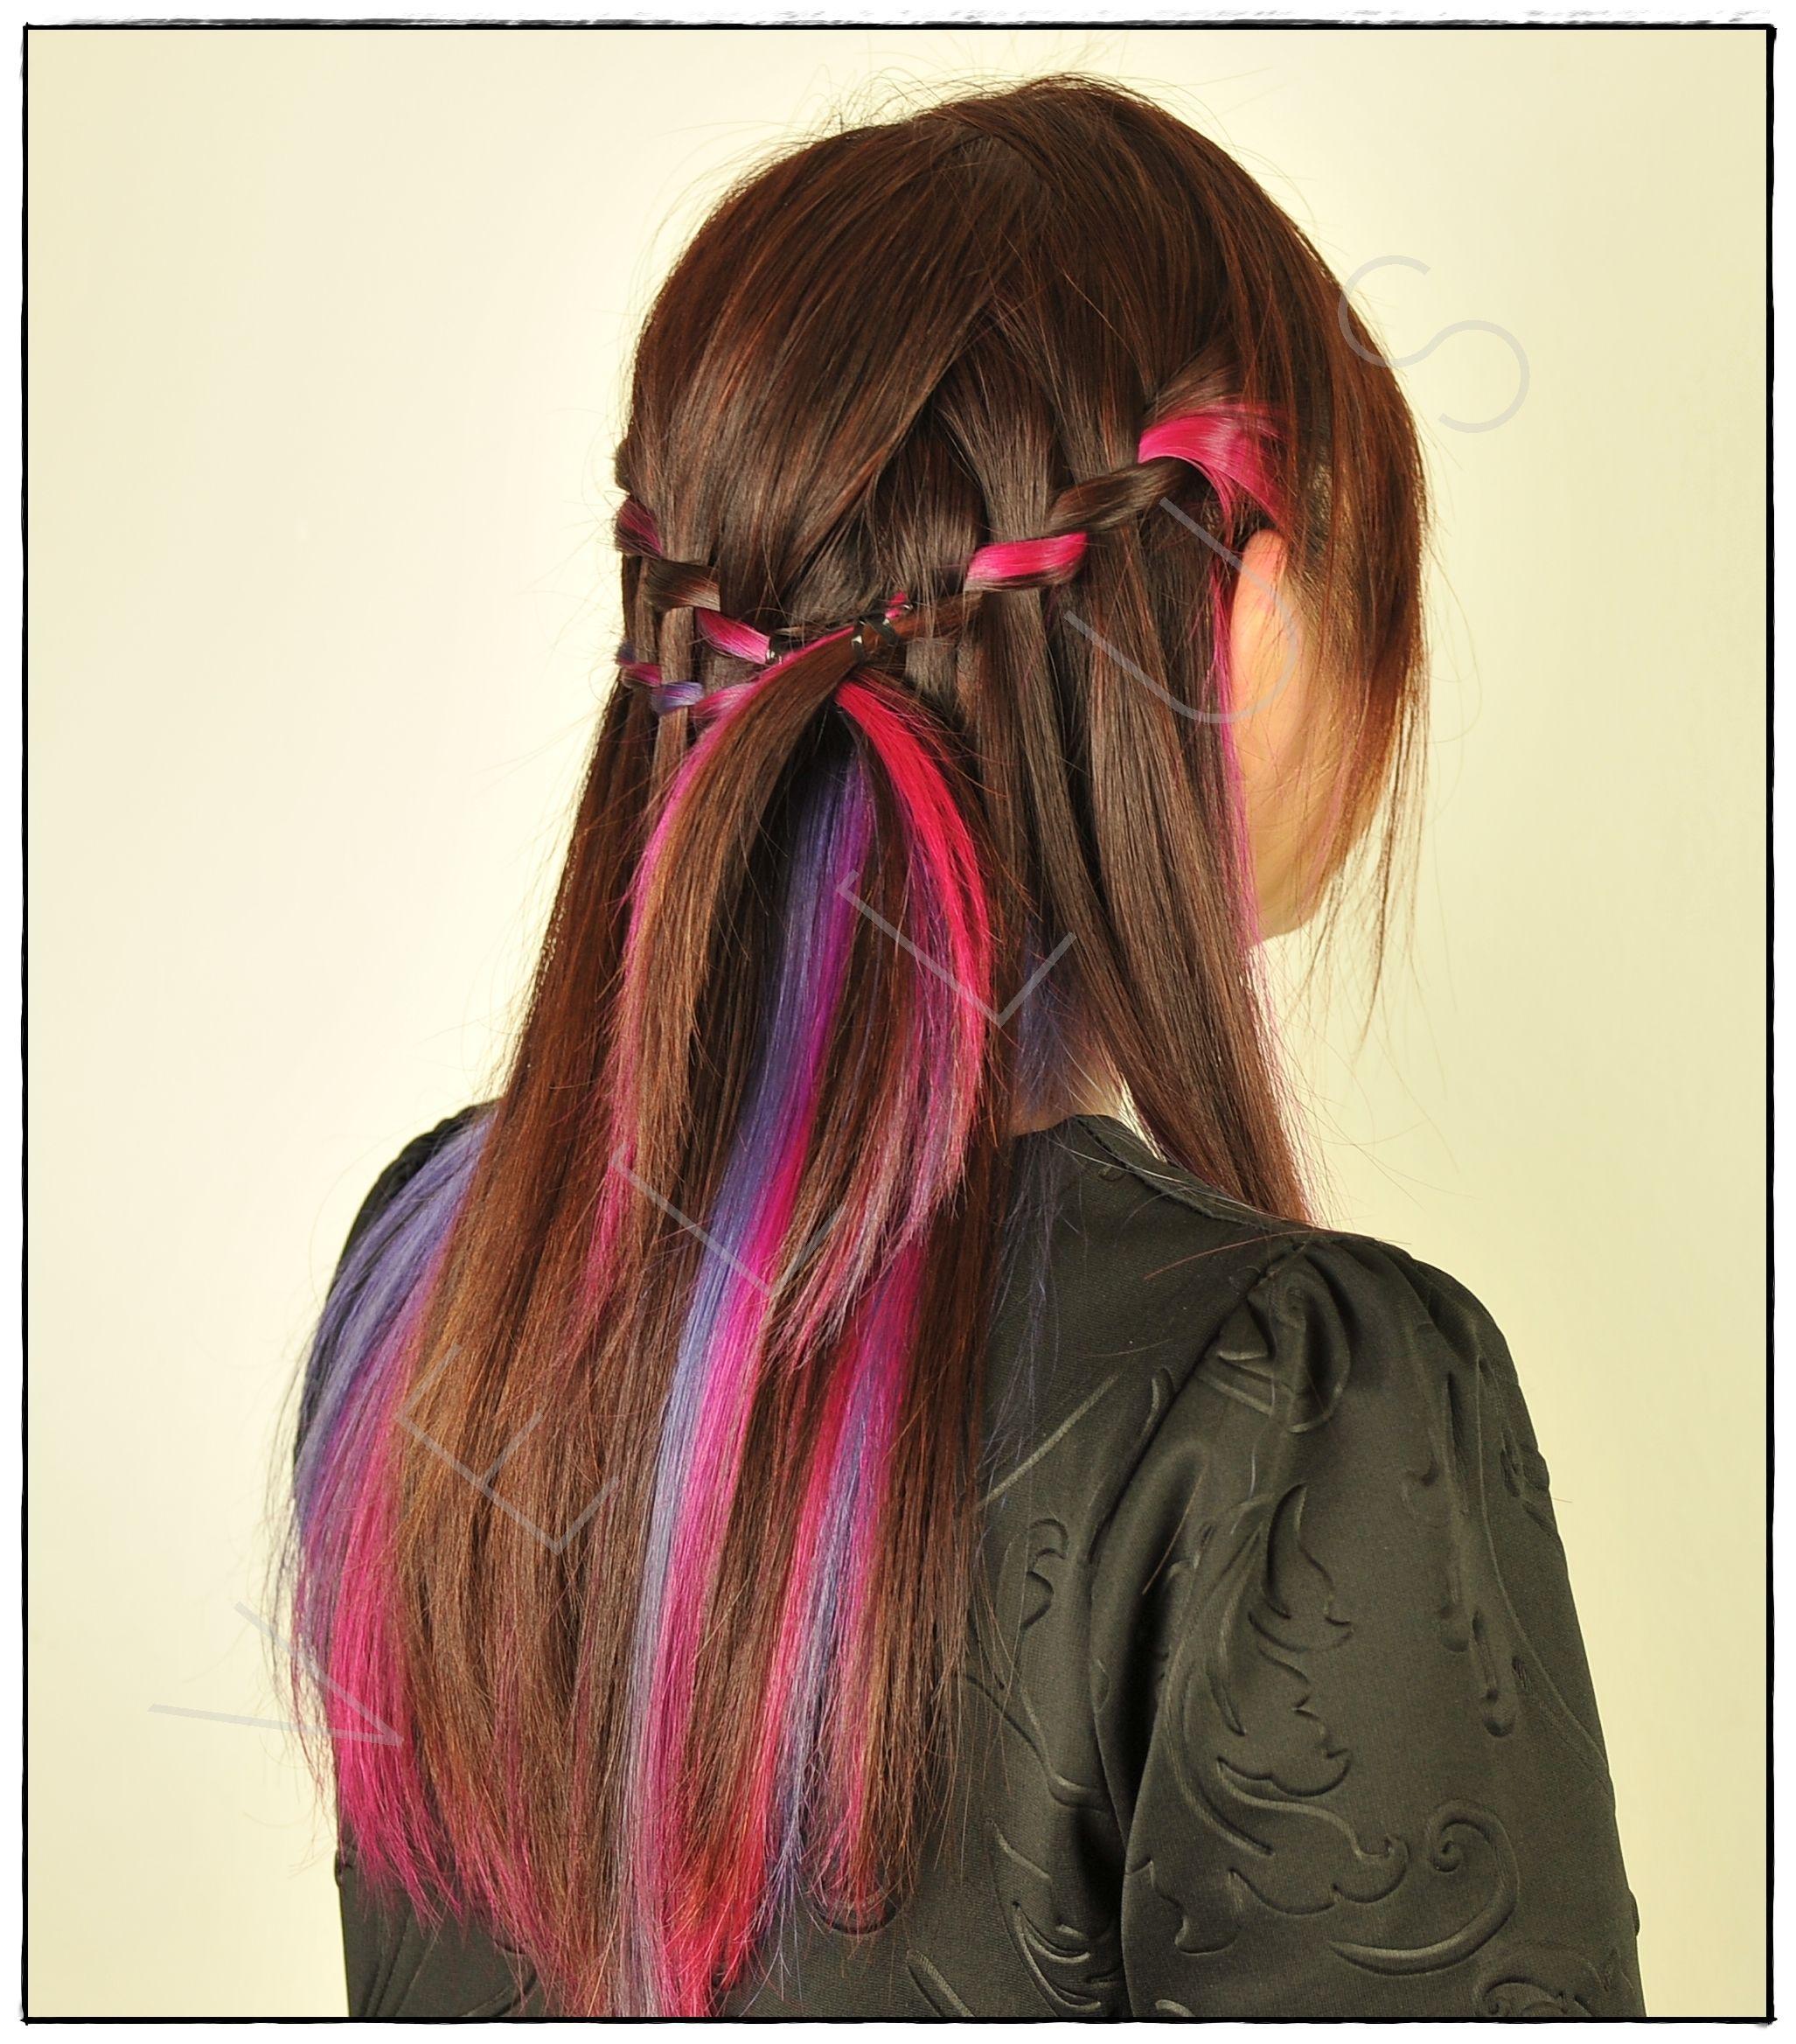 Manic Panic Hair Dye Manic panic hair dye, Manic panic